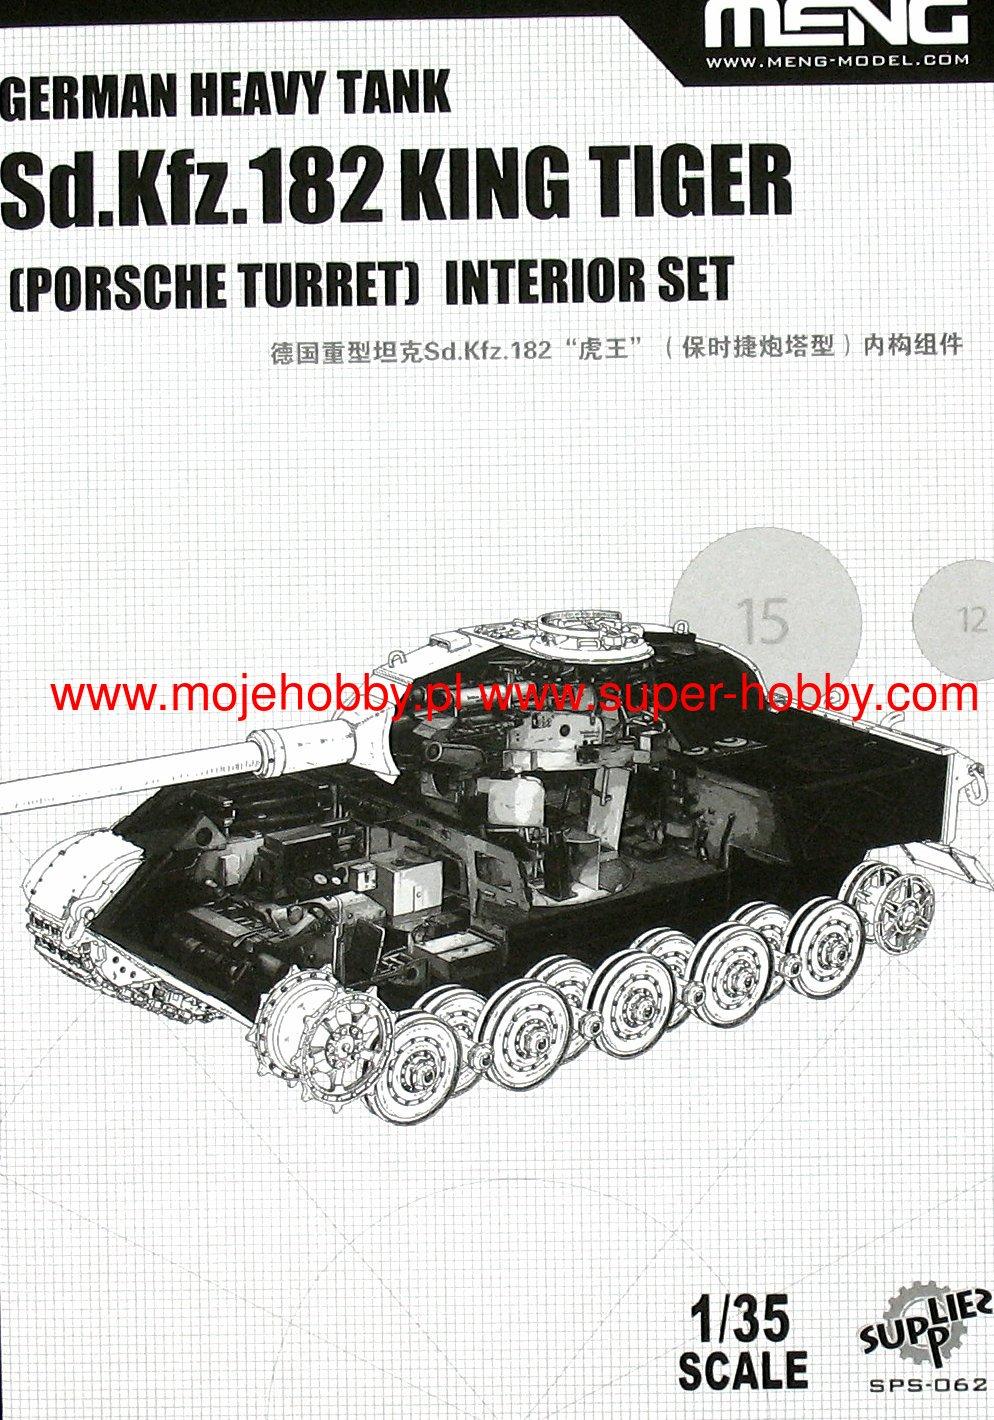 Model Kits Porsche Turret Meng 1 35 Sd Kfz 182 King Tiger German Heavy Tank Interior Set Com